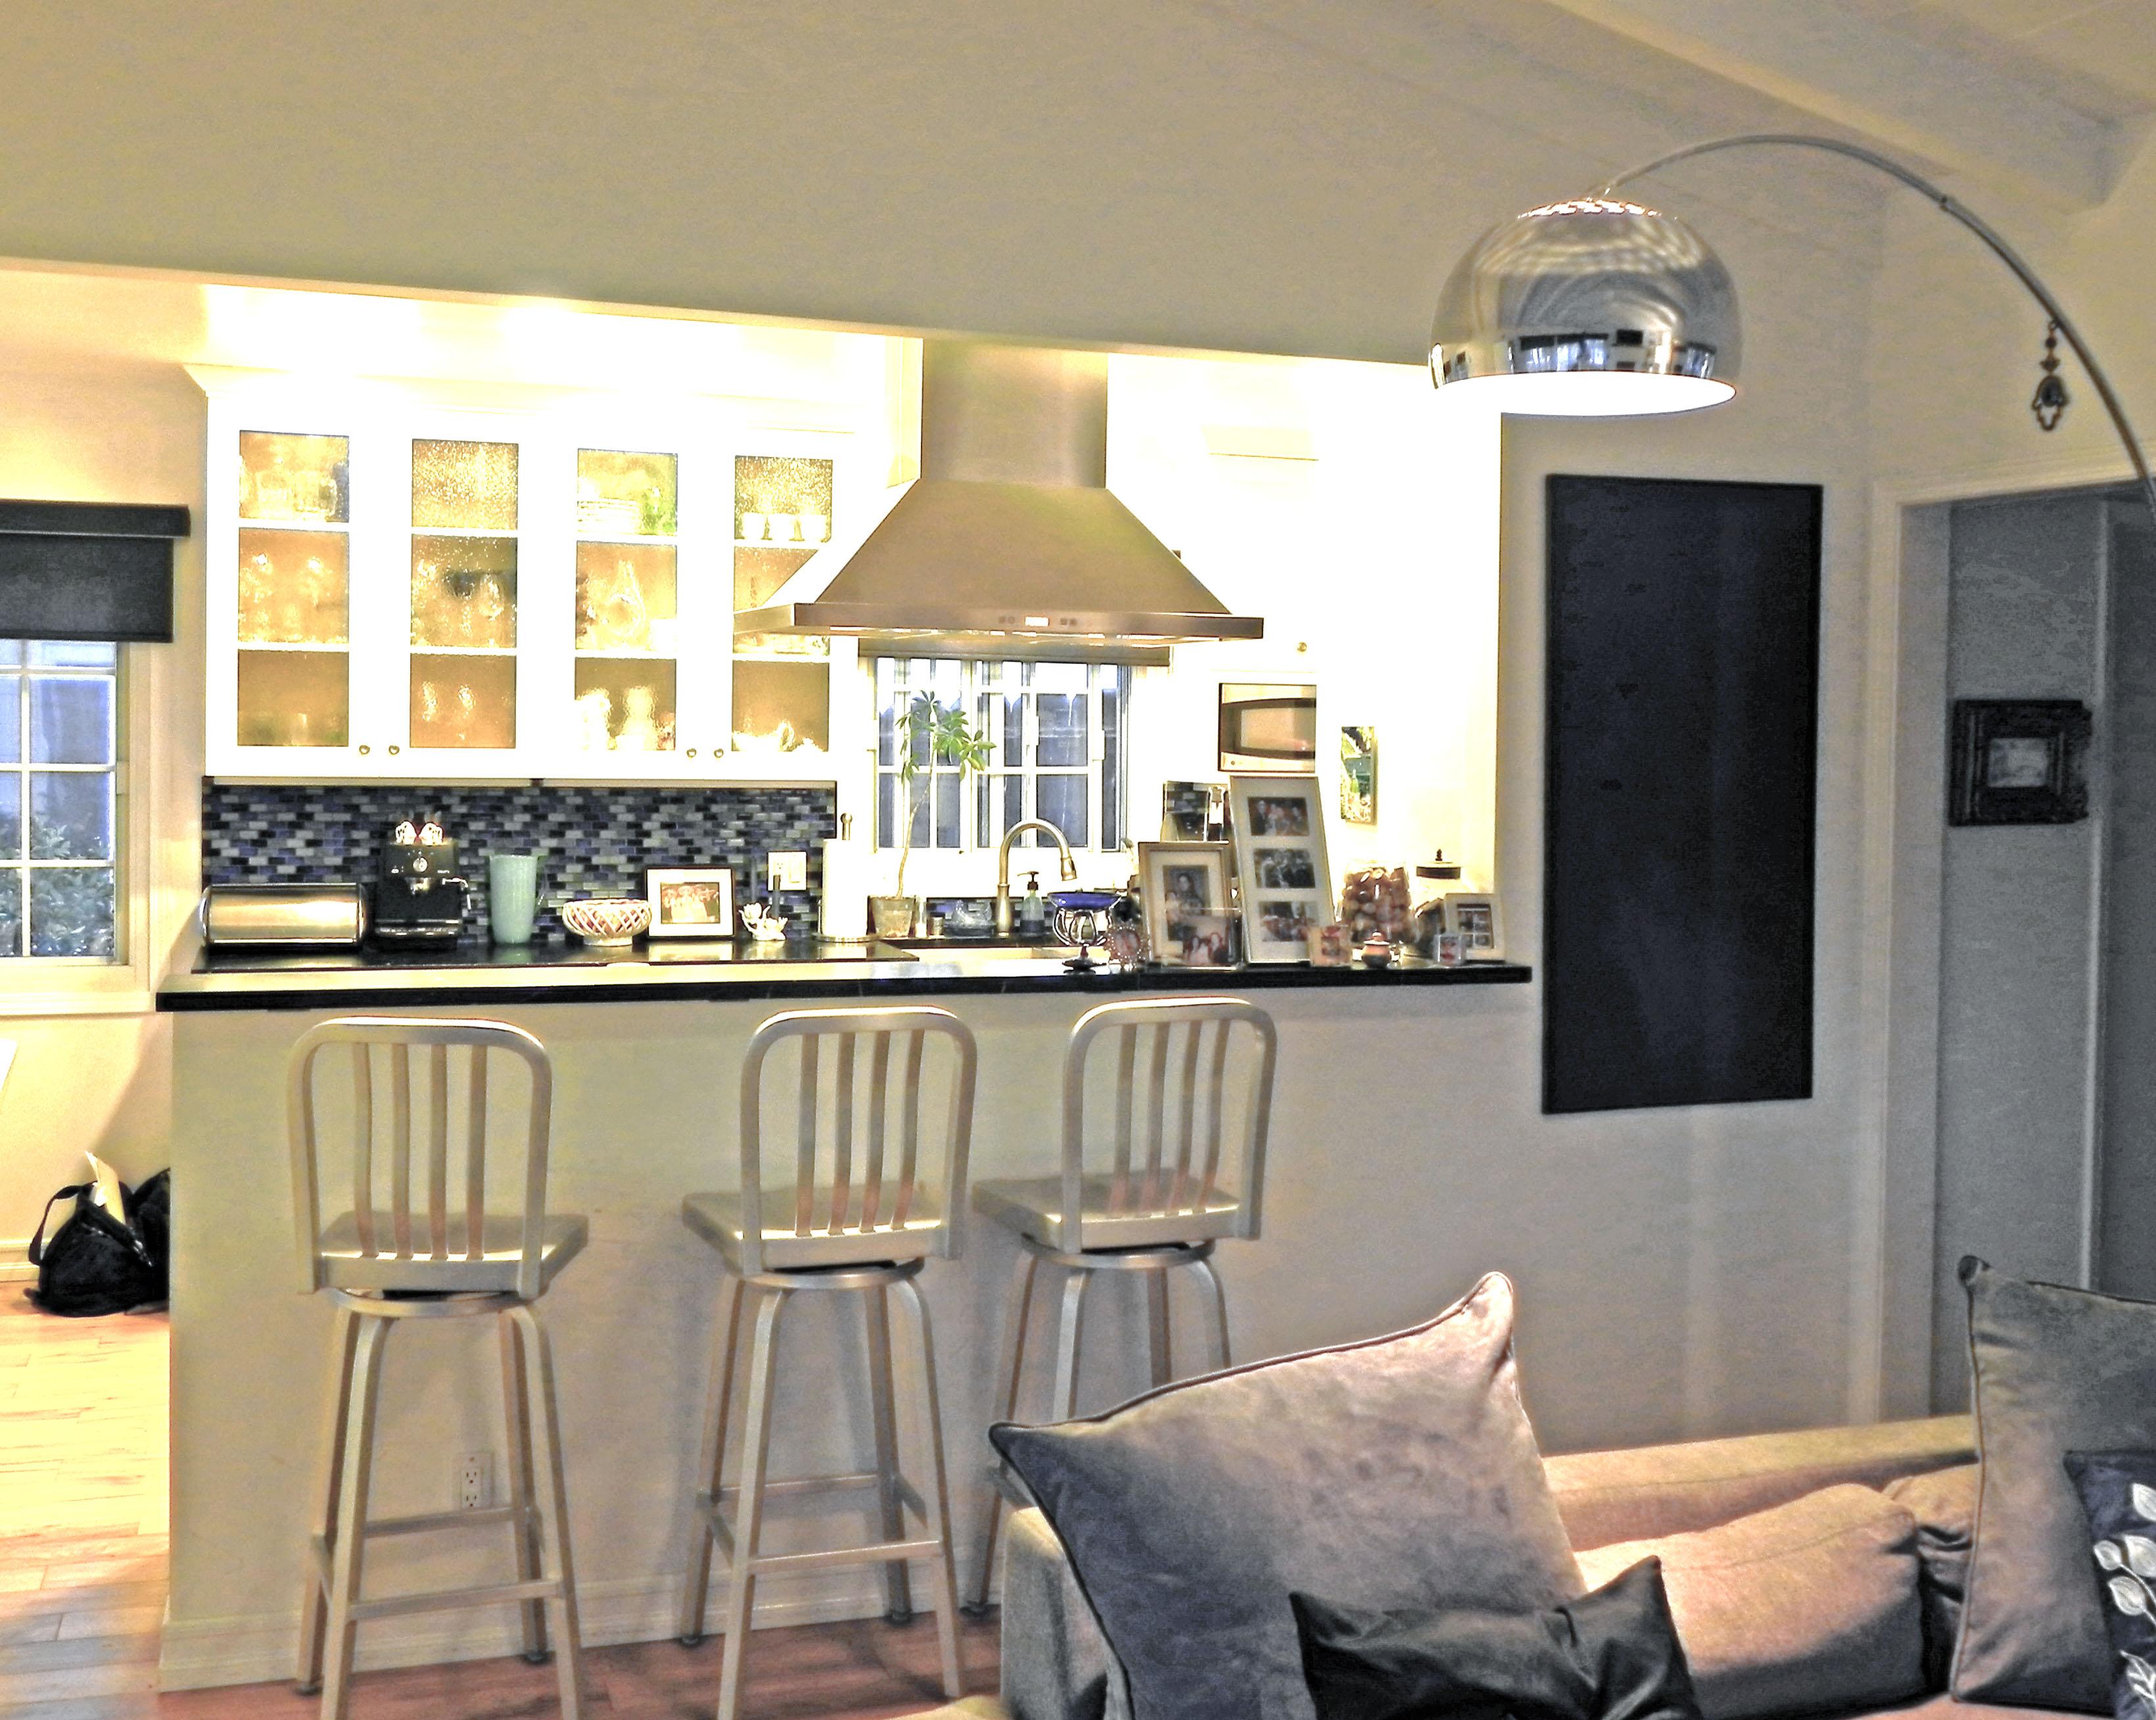 kitchen remodeling los angeles: open kitchen floor plan